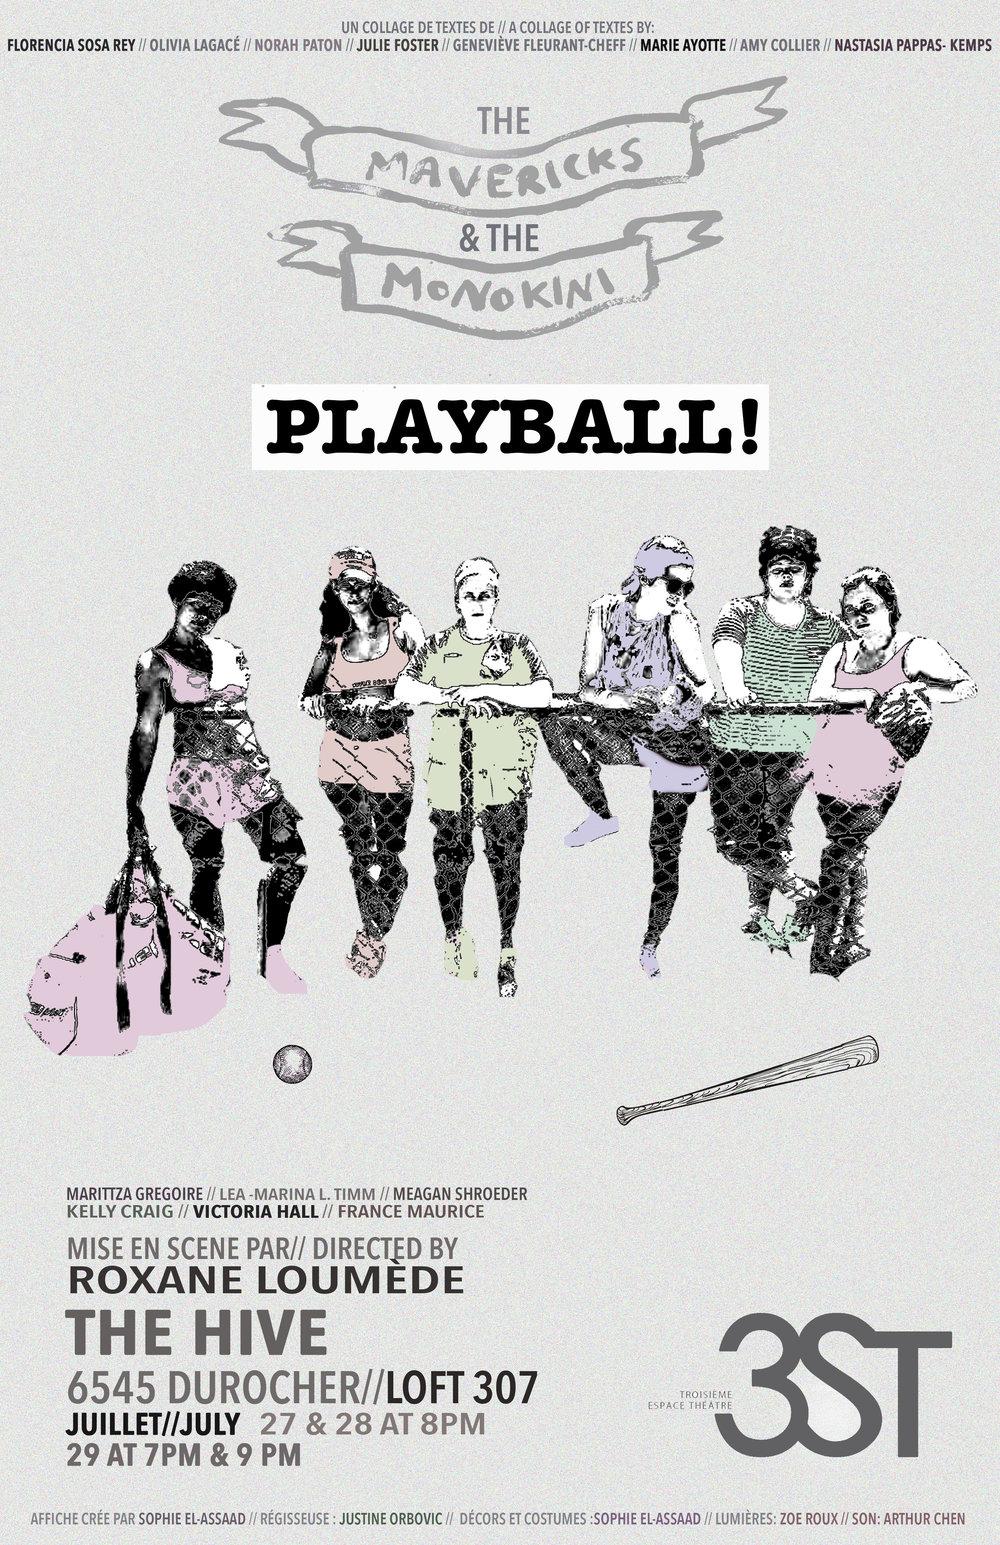 Mavericks and the Monokini: Playball! (3ST) / Set & Costume design